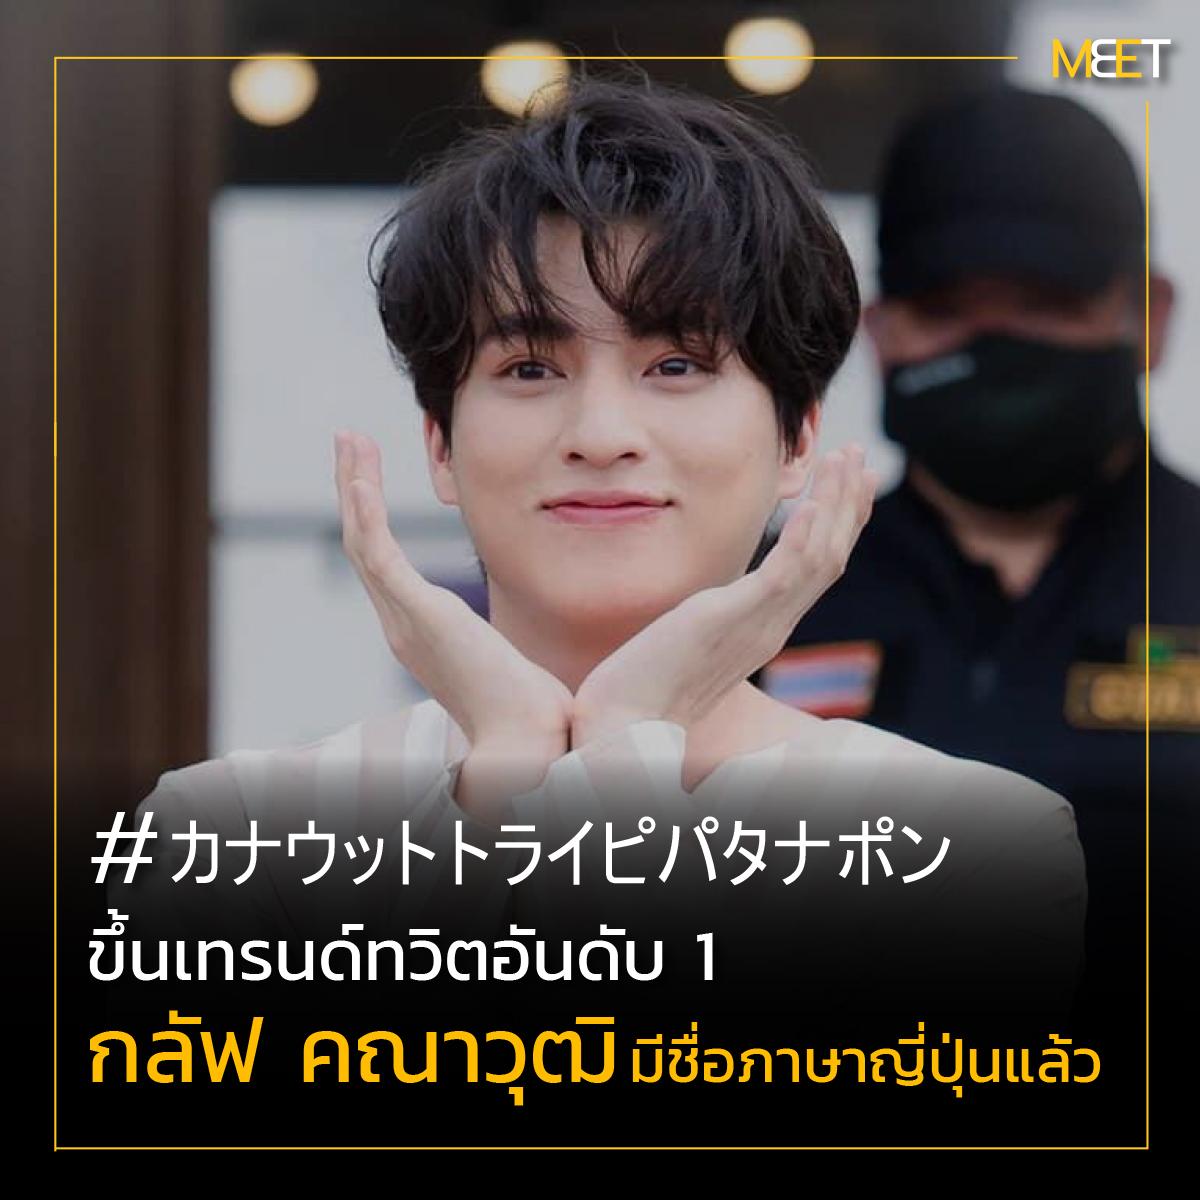 "MEET x News : ดังไกลถึงแดนปลาดิบ! ""กลัฟ คณาวุฒิ"" มีชื่อภาษาญี่ปุ่นแล้ว ไปให้สุดเลยลูกกกก #カナウットトライピパタナポン #GulfKanawut   web.facebook.com/MeetForAmity/p…"